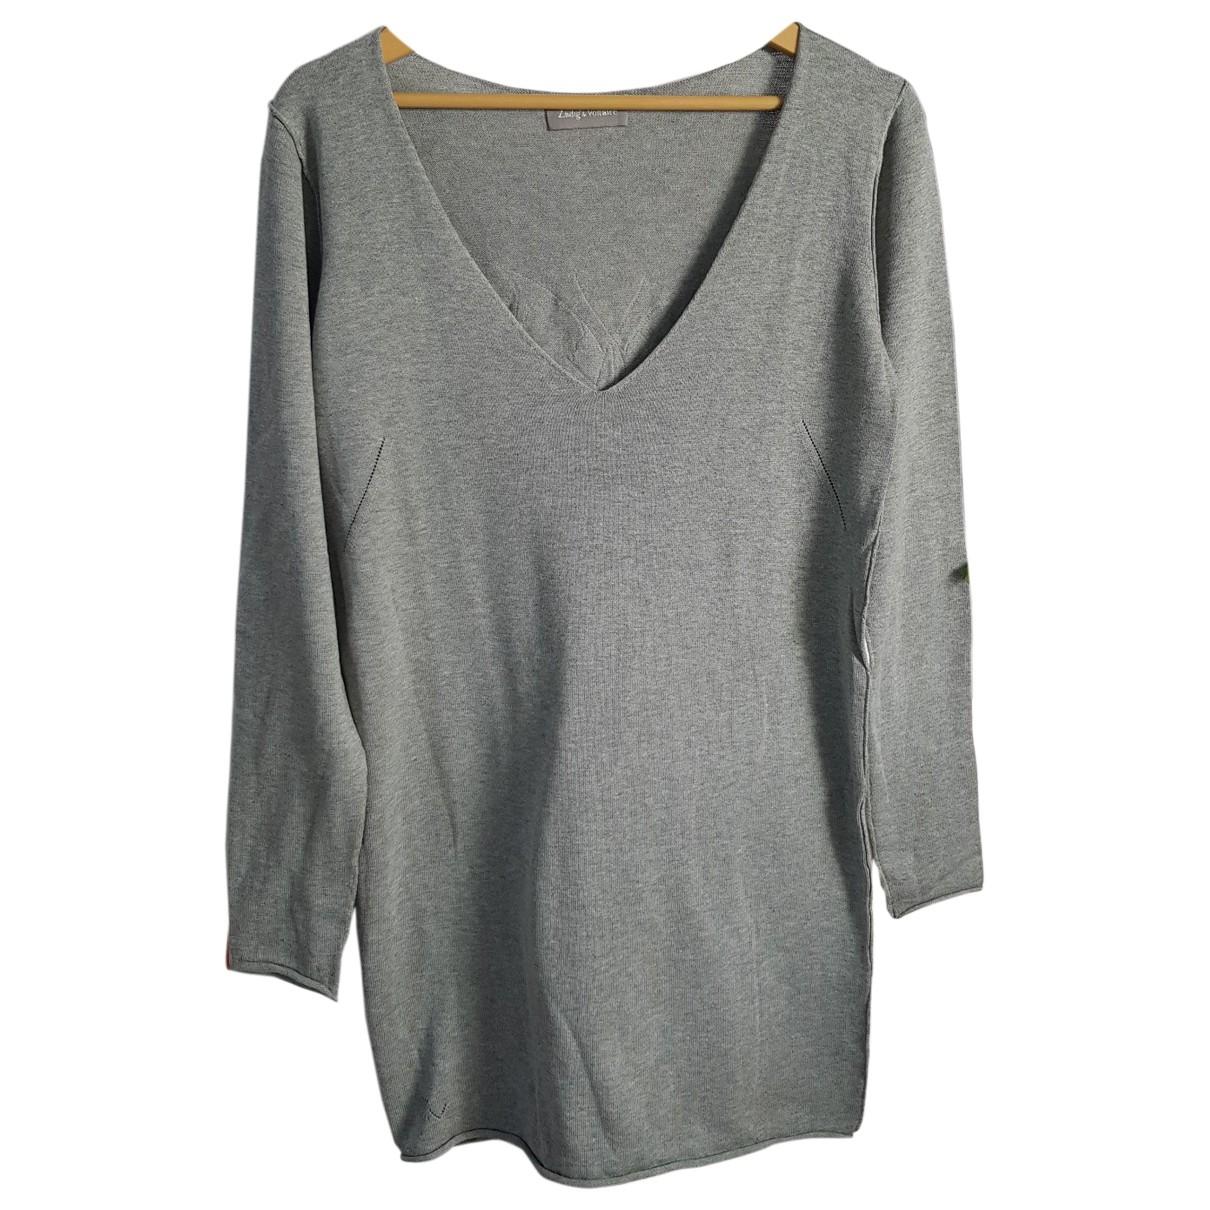 Zadig & Voltaire \N Green Cotton dress for Women S International